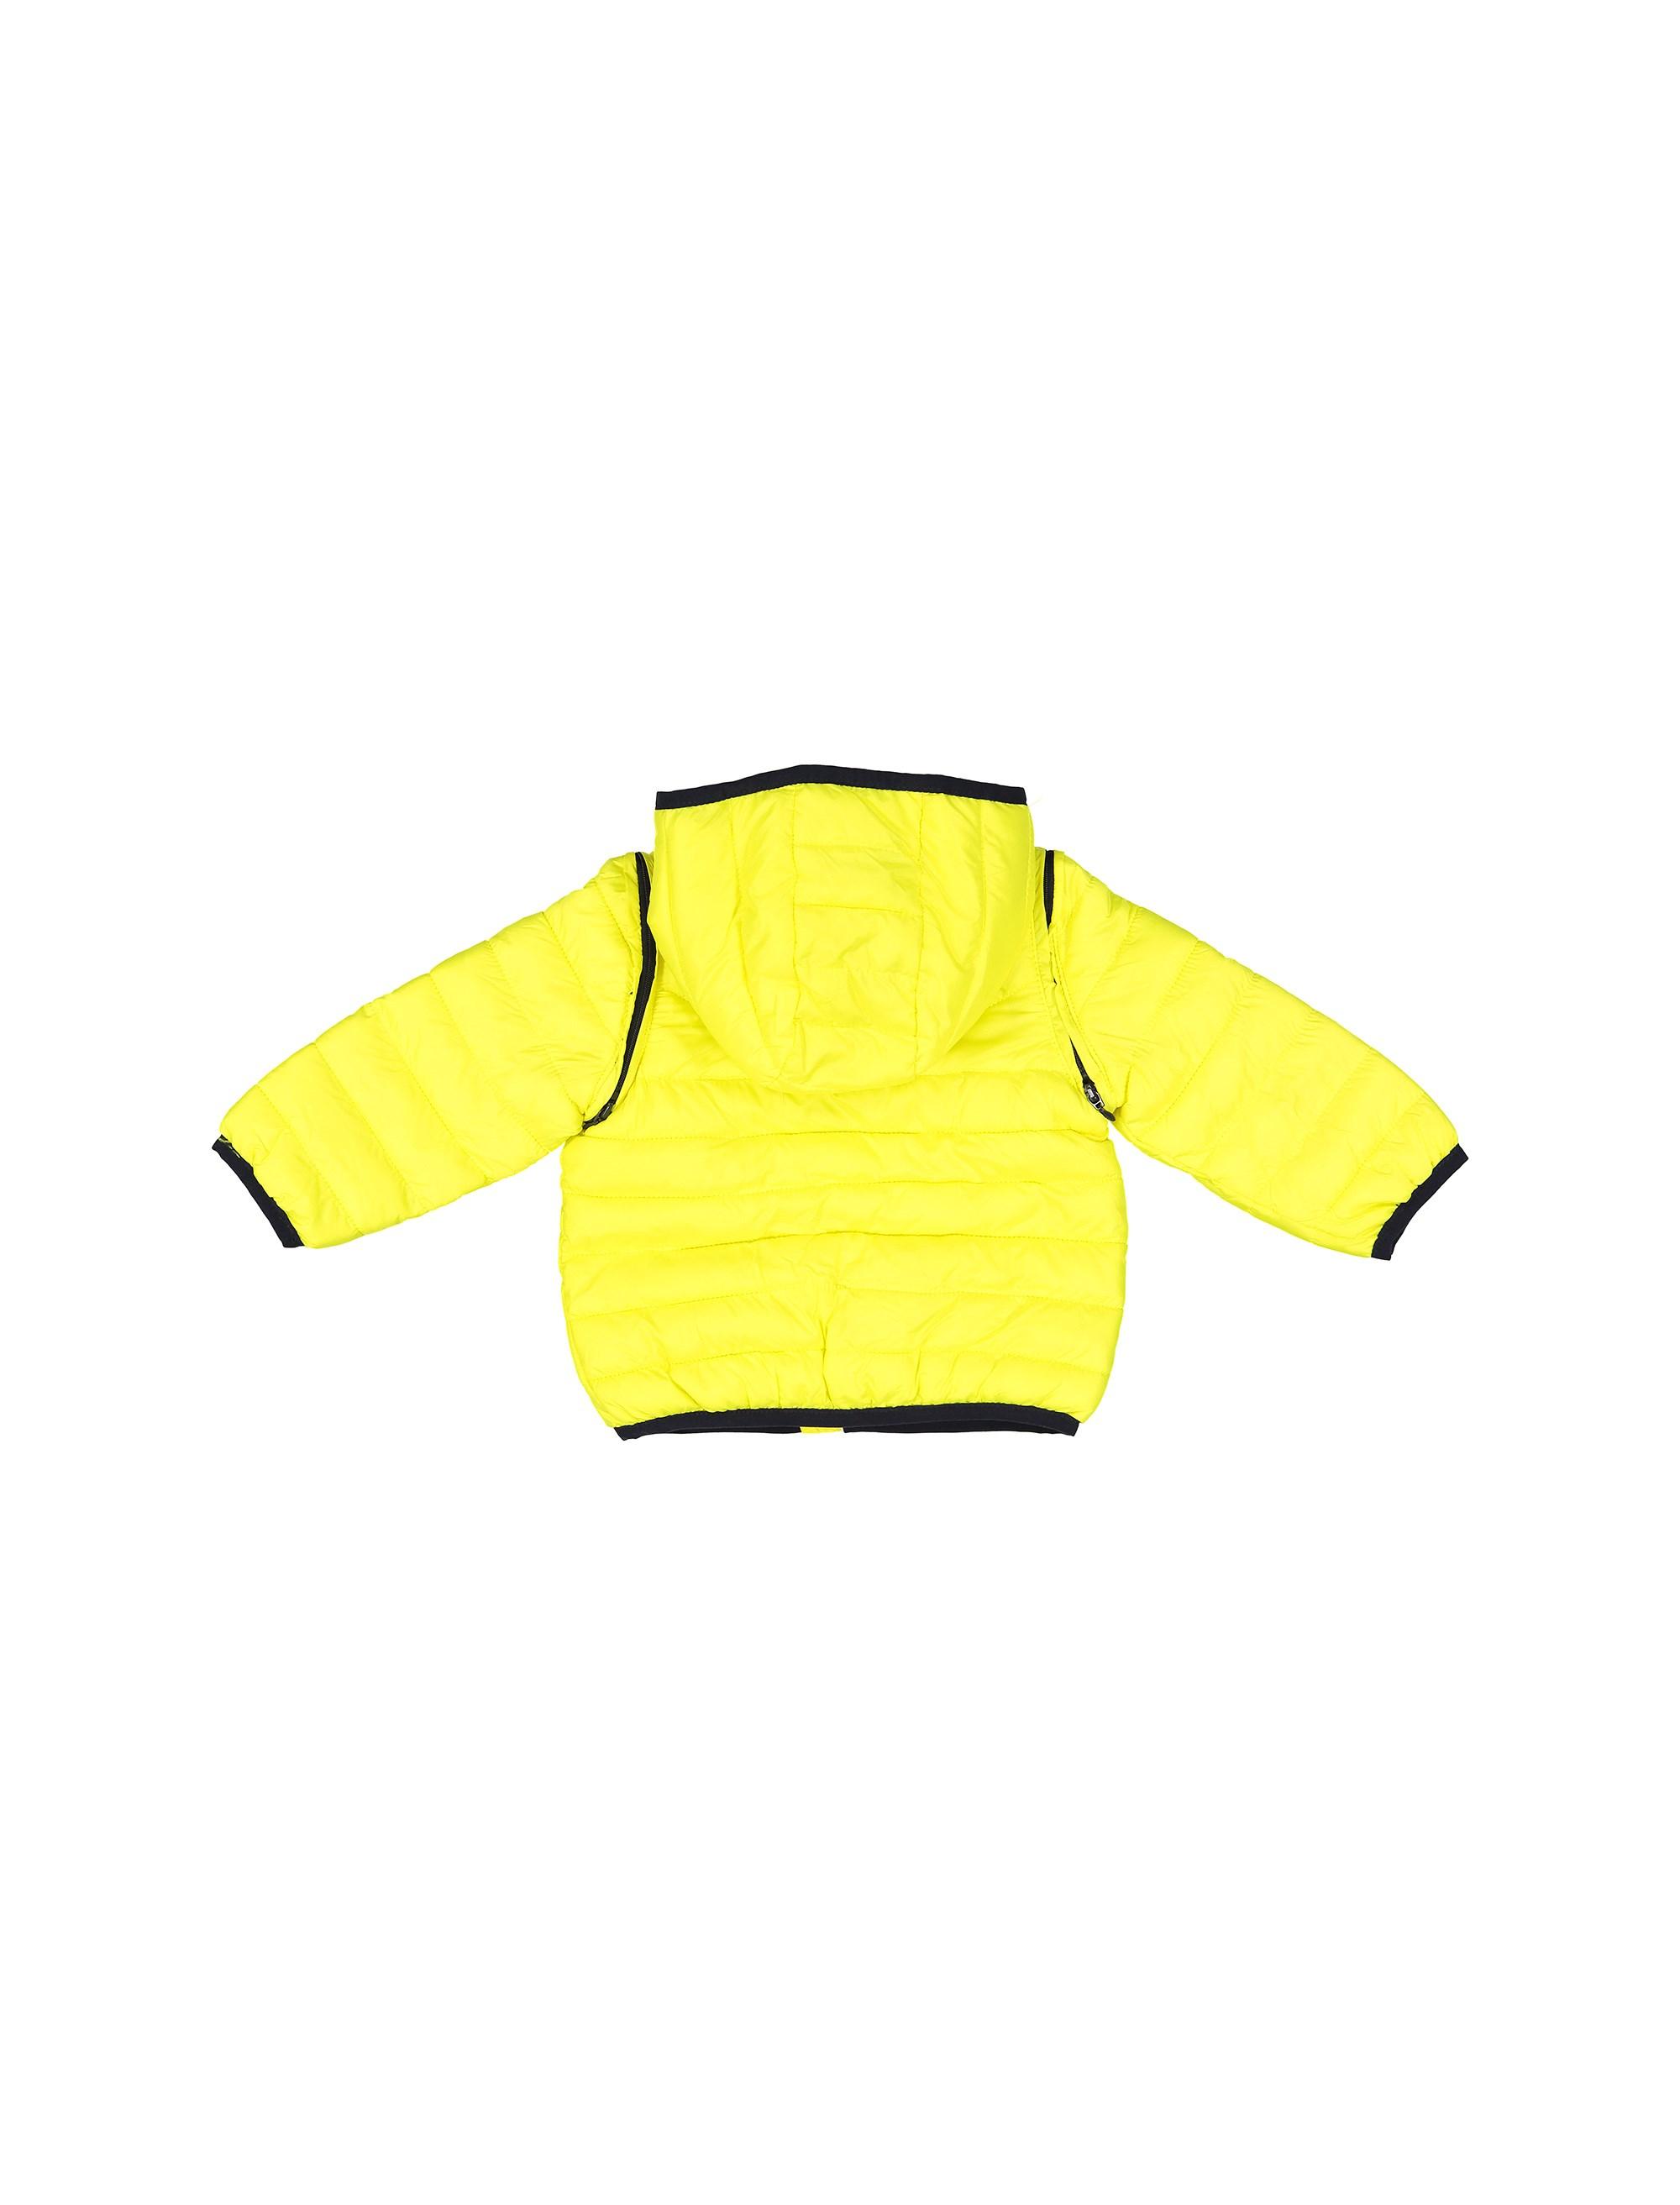 کاپشن نوزادی پسرانه - زرد - 3